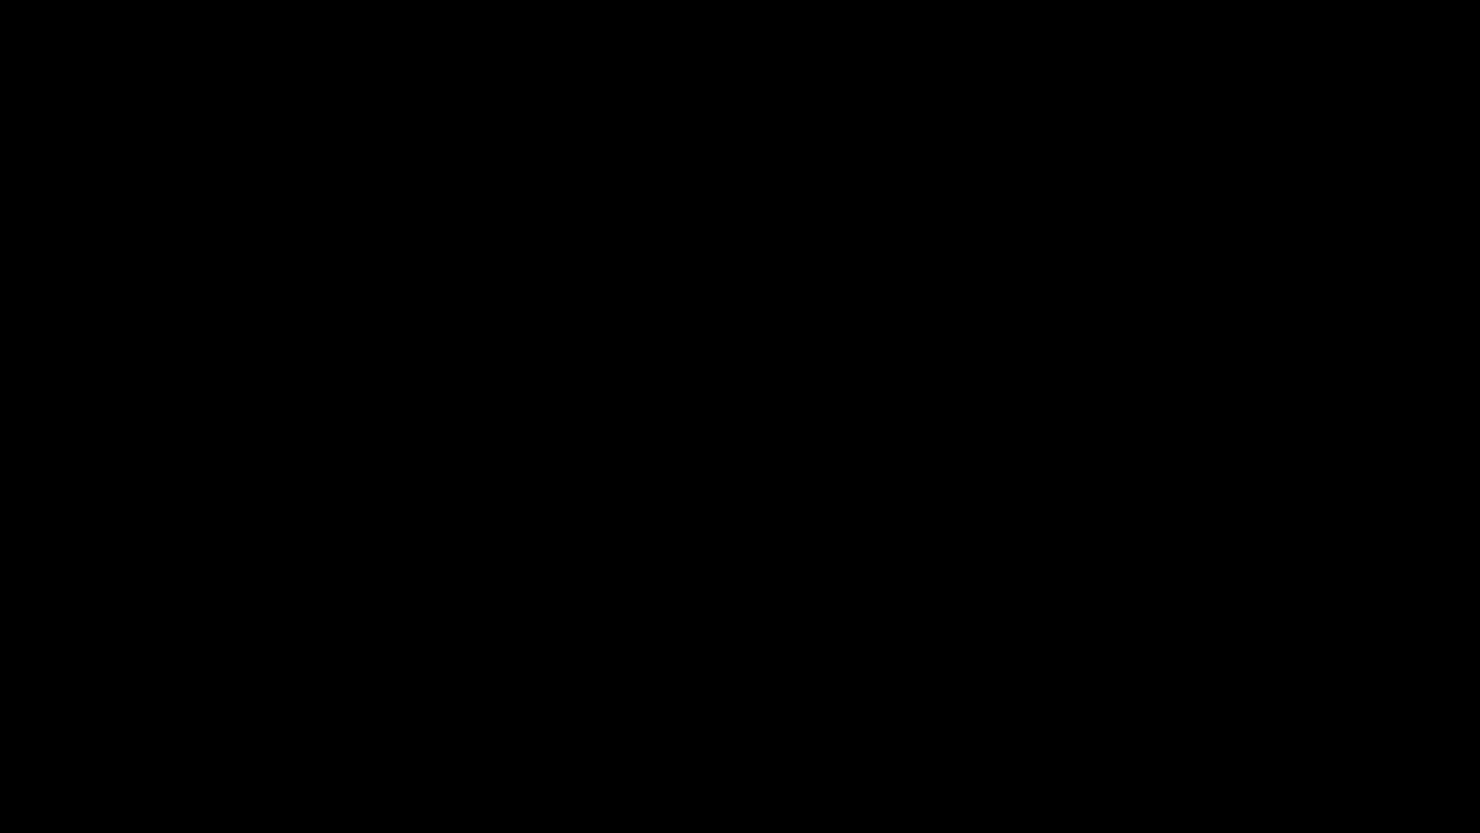 militech_logotype_black